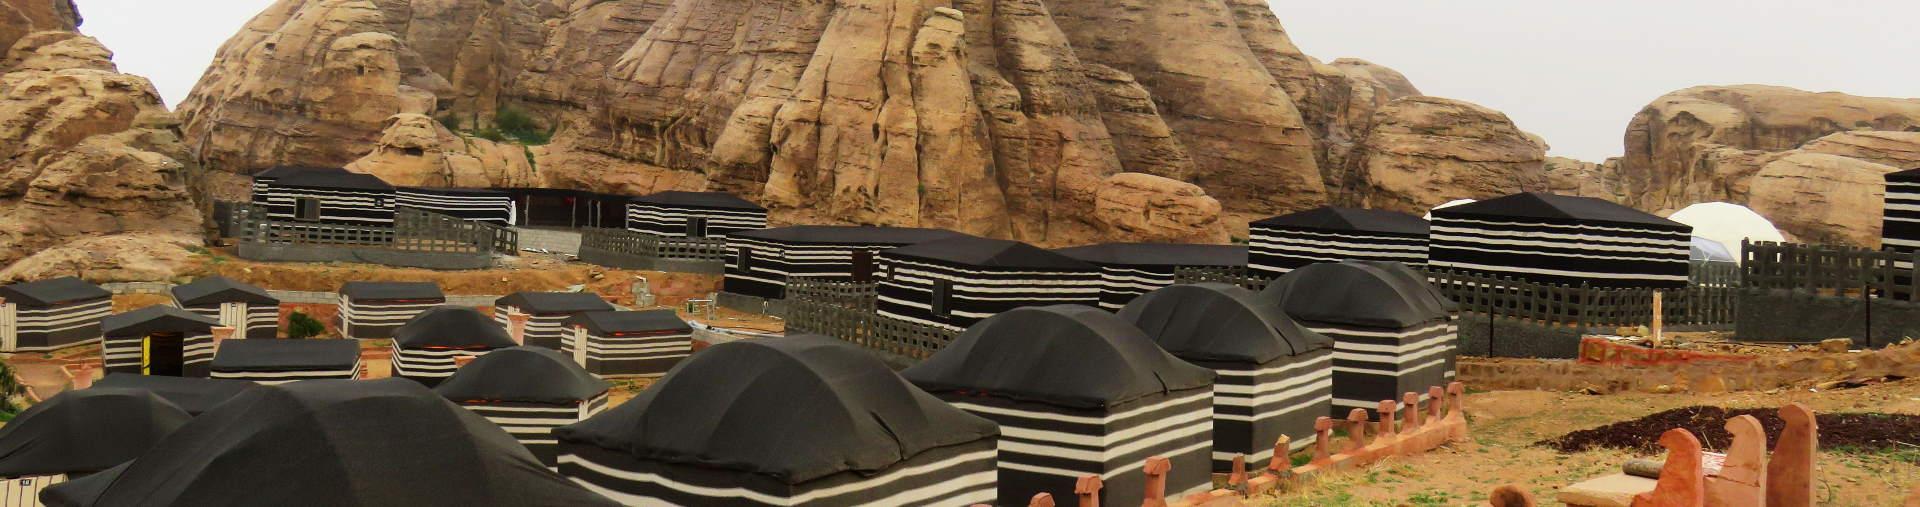 Petra Tour from Tel Aviv 2 Day Tour